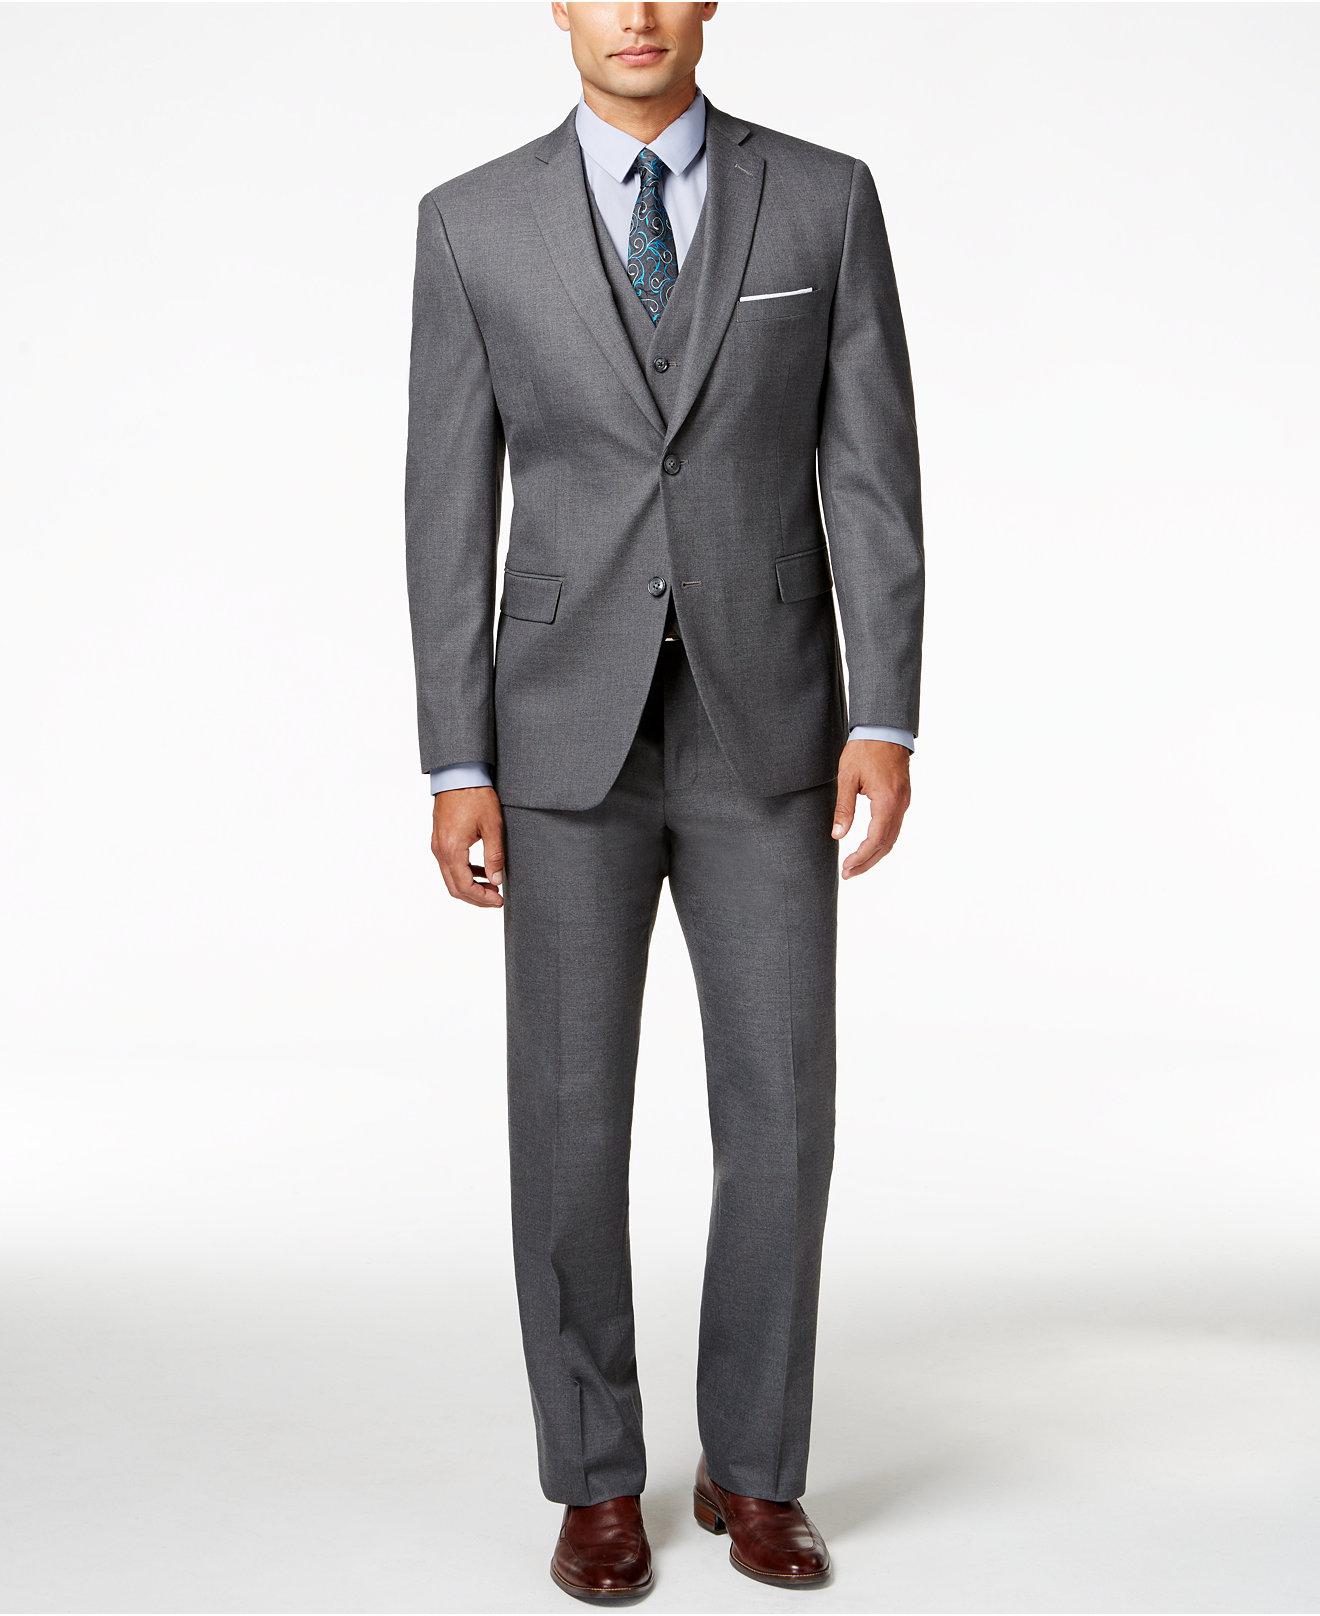 Alfani Men's Traveler Grey Solid Slimfit Suit Separates, Created For Macy's